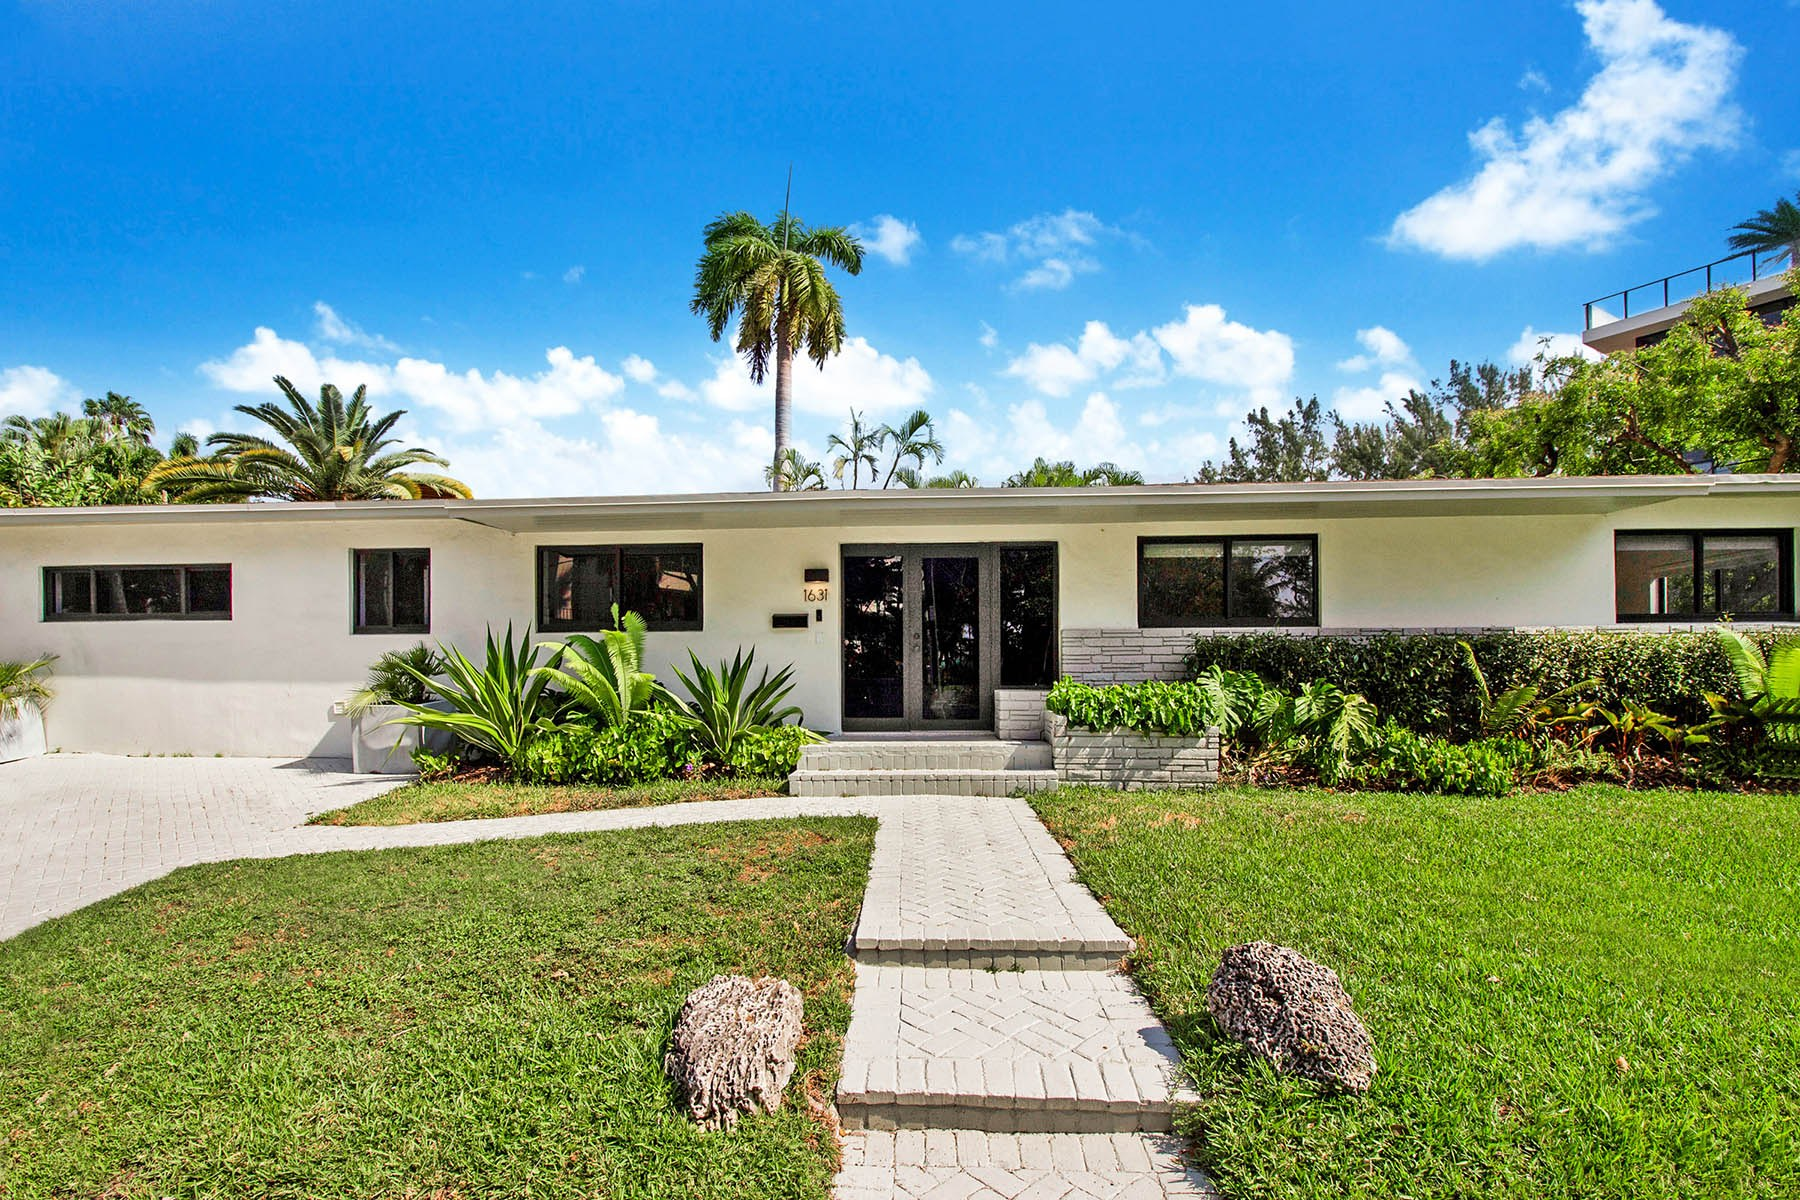 Single Family Homes 为 销售 在 1631 S Bayshore Court, Coconut Grove, FL 1631 S Bayshore Court 椰树林, 佛罗里达州 33133 美国